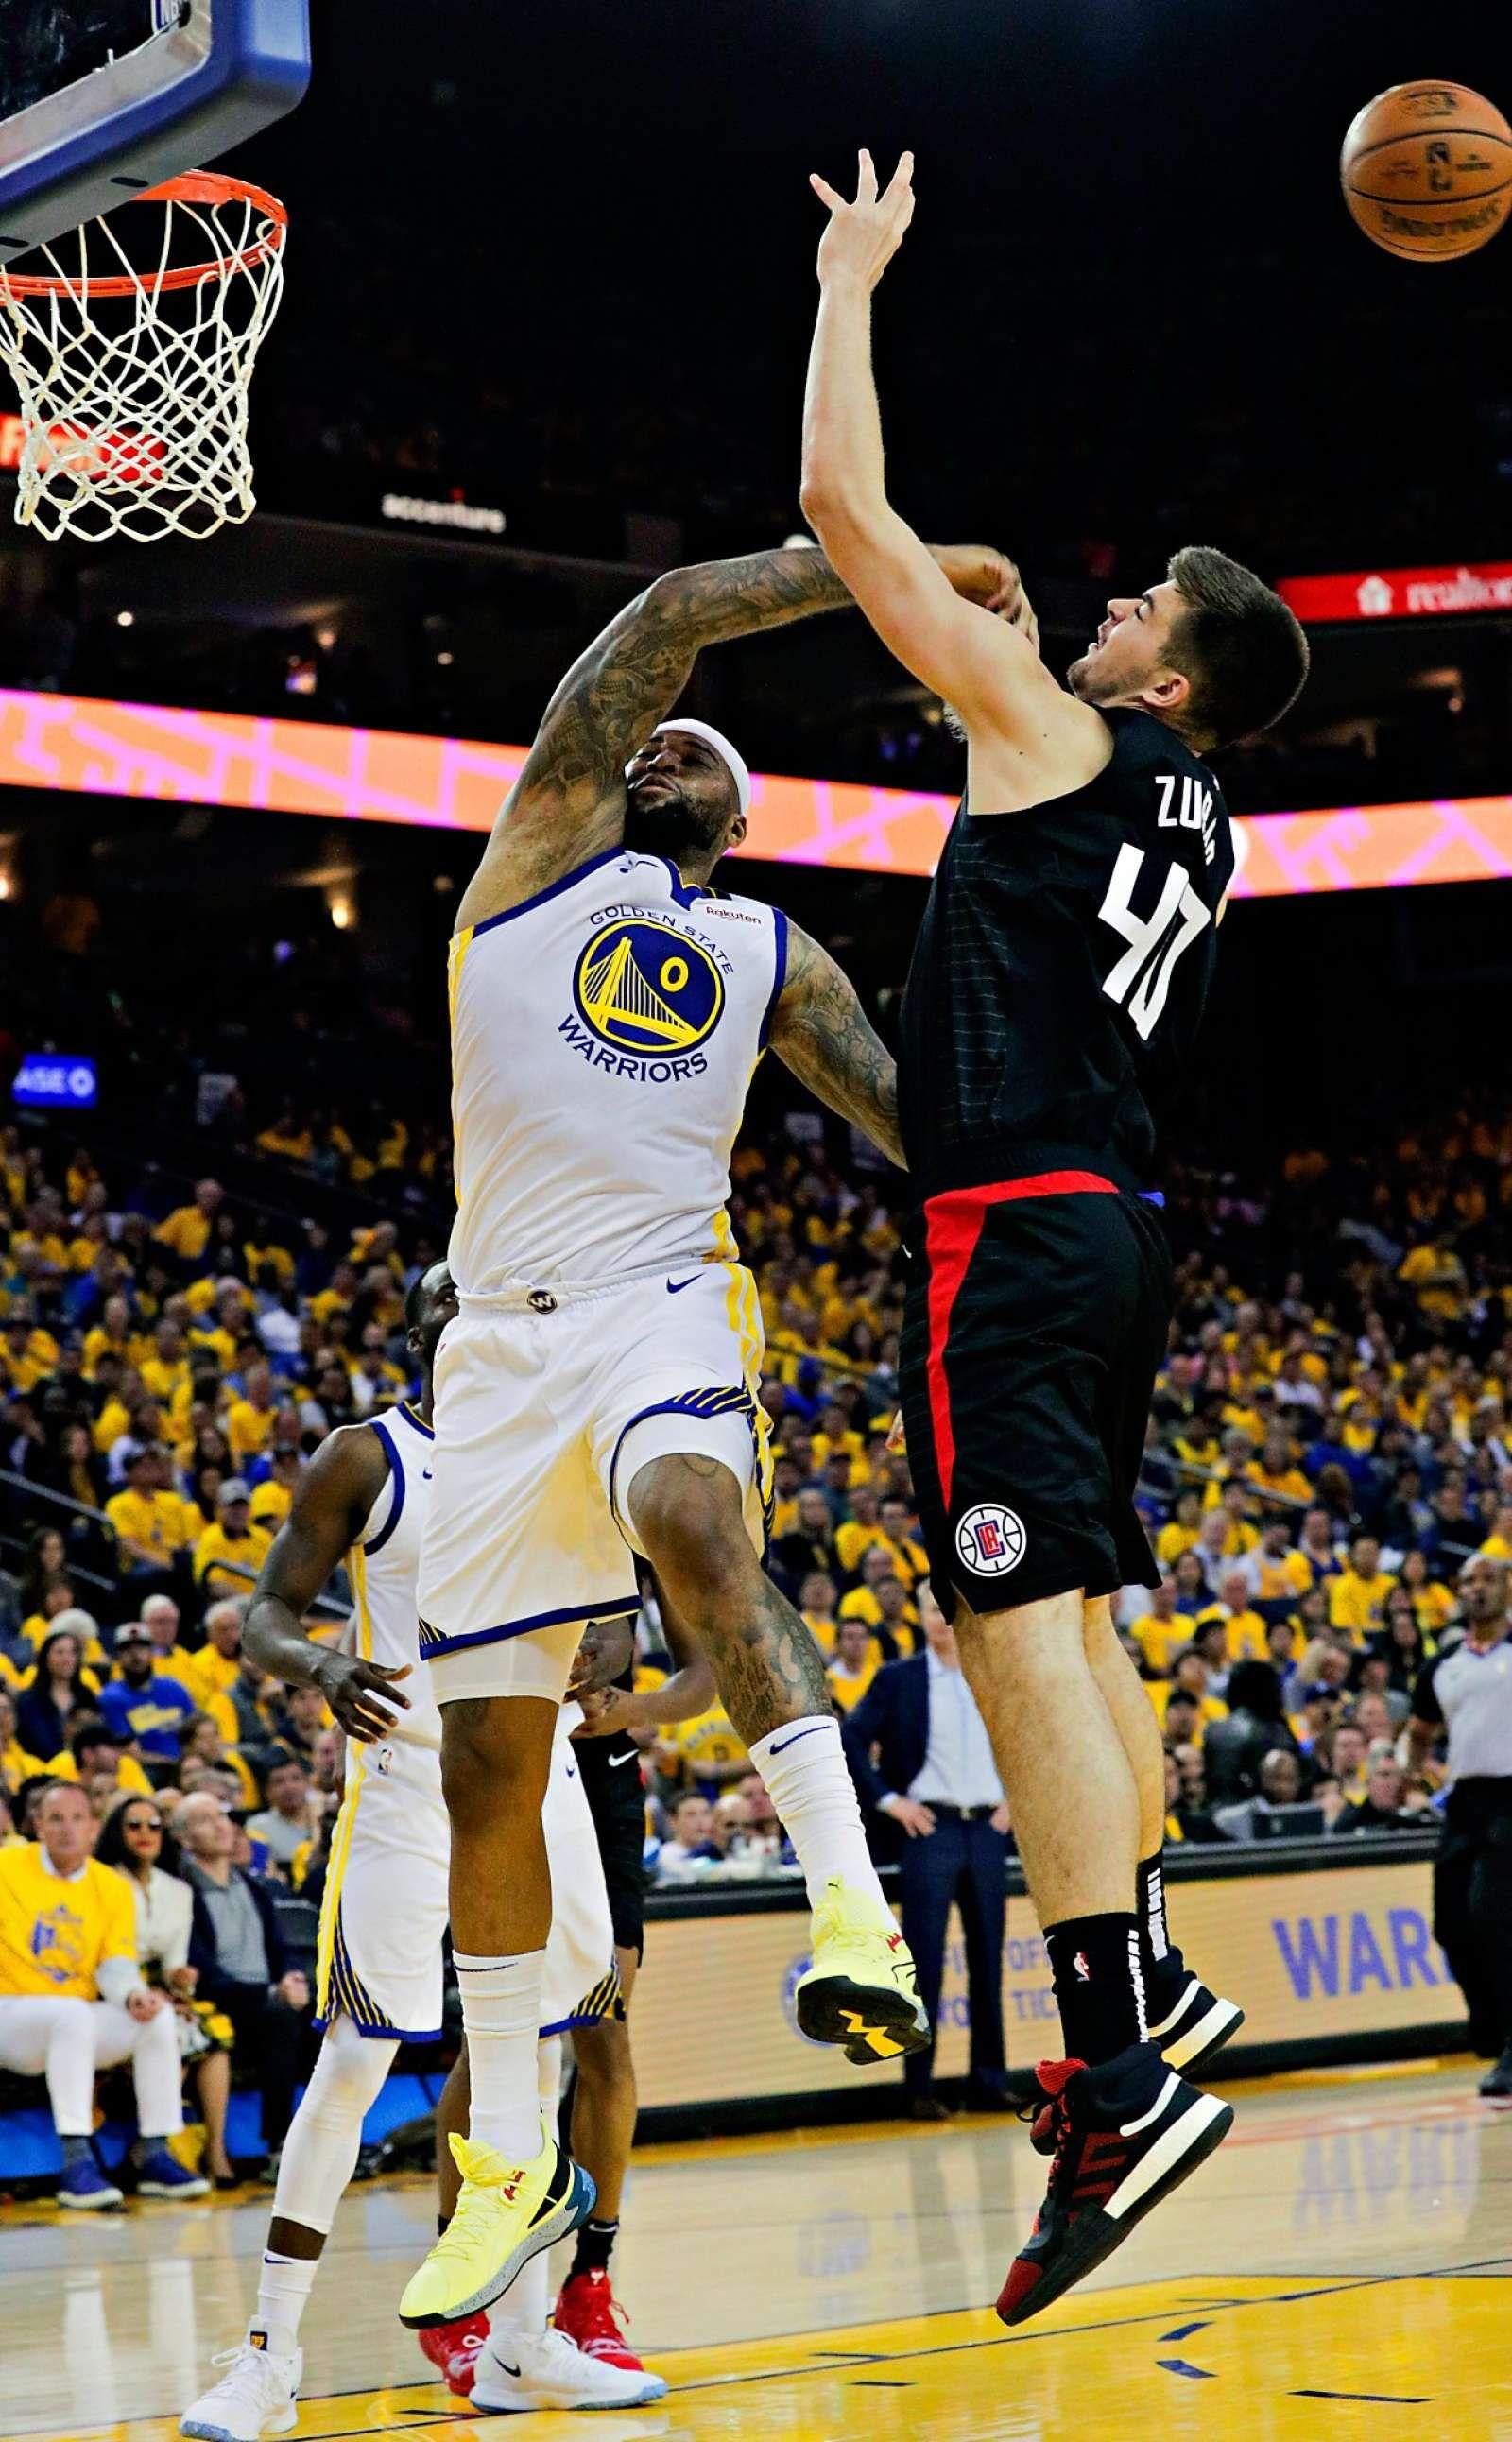 Warriors 2019 NBA playoffs visual essay Chasing history